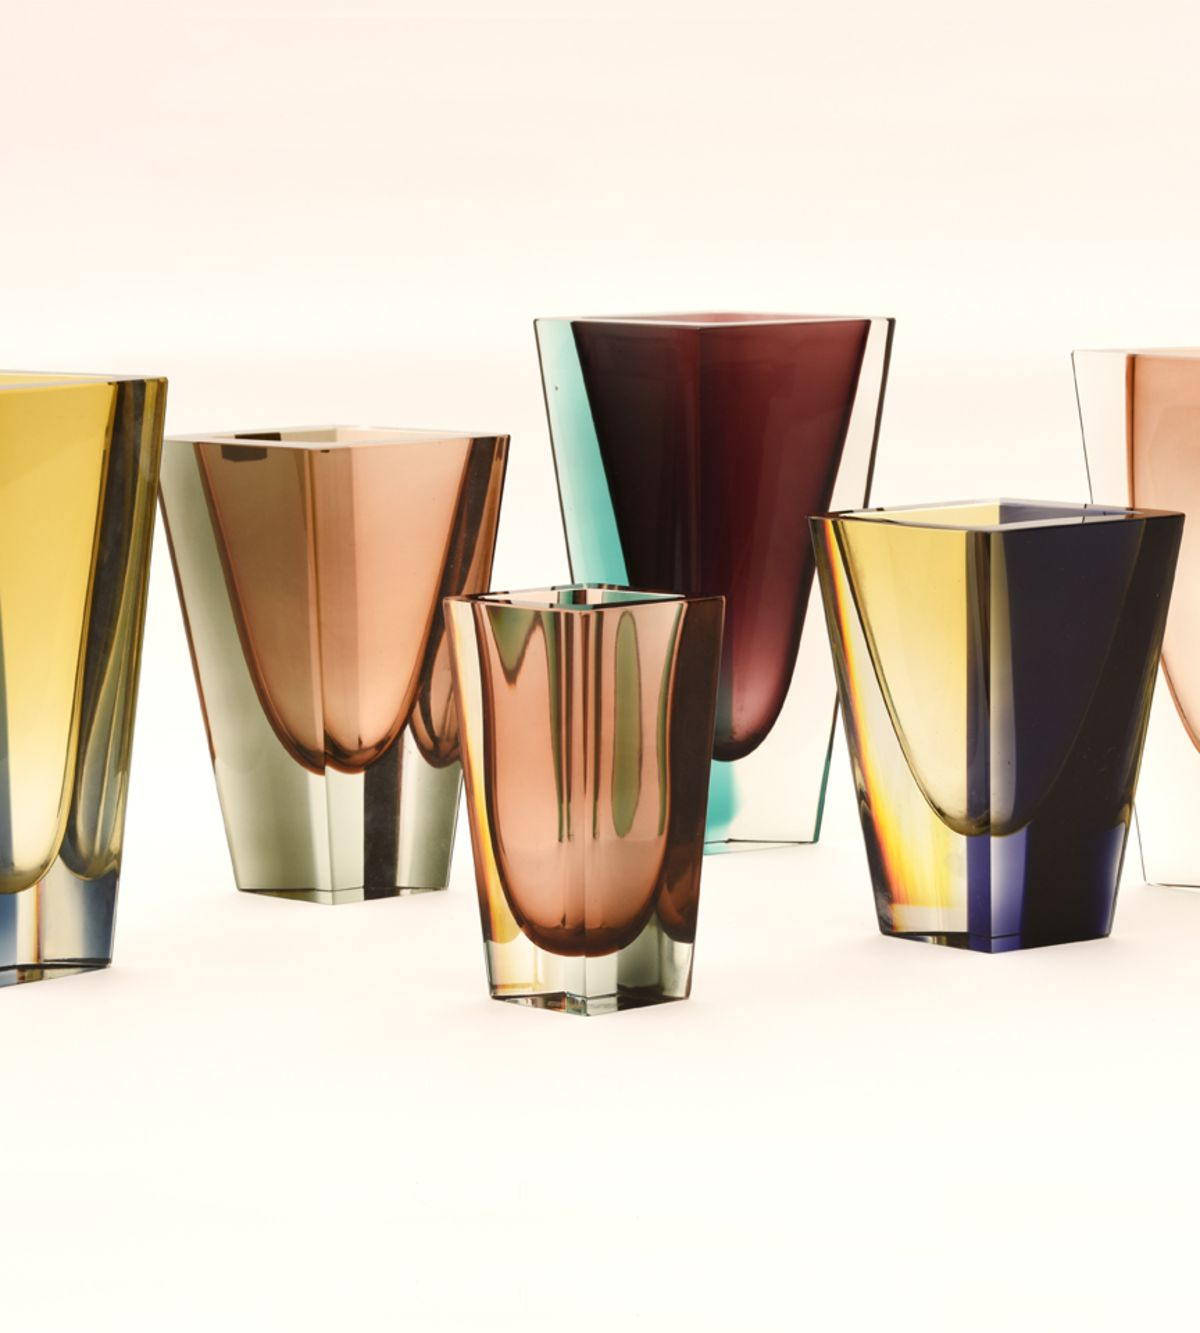 Prisma vases